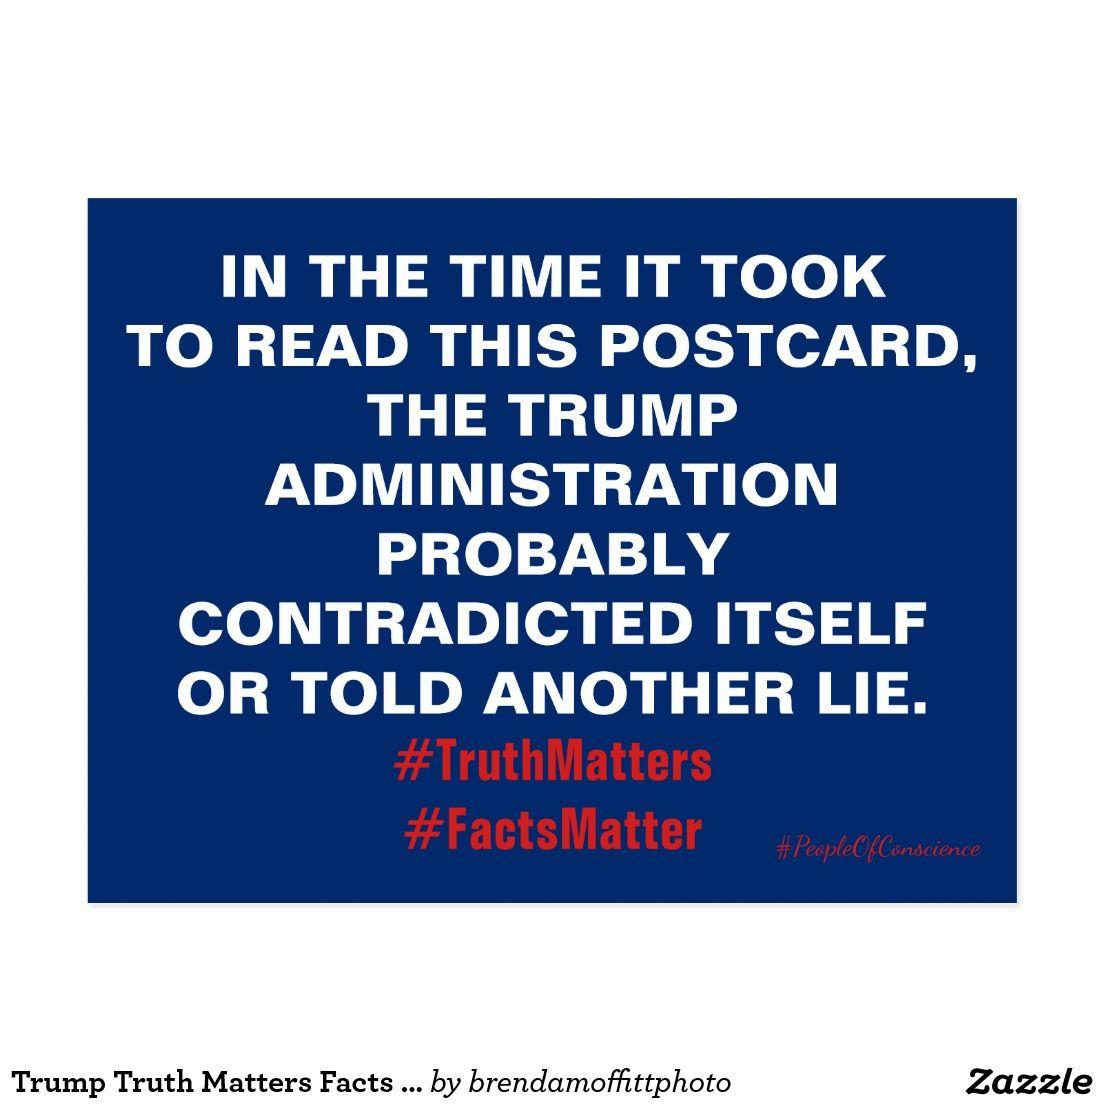 Trump Truth Matters Facts Matter Resist Postcard